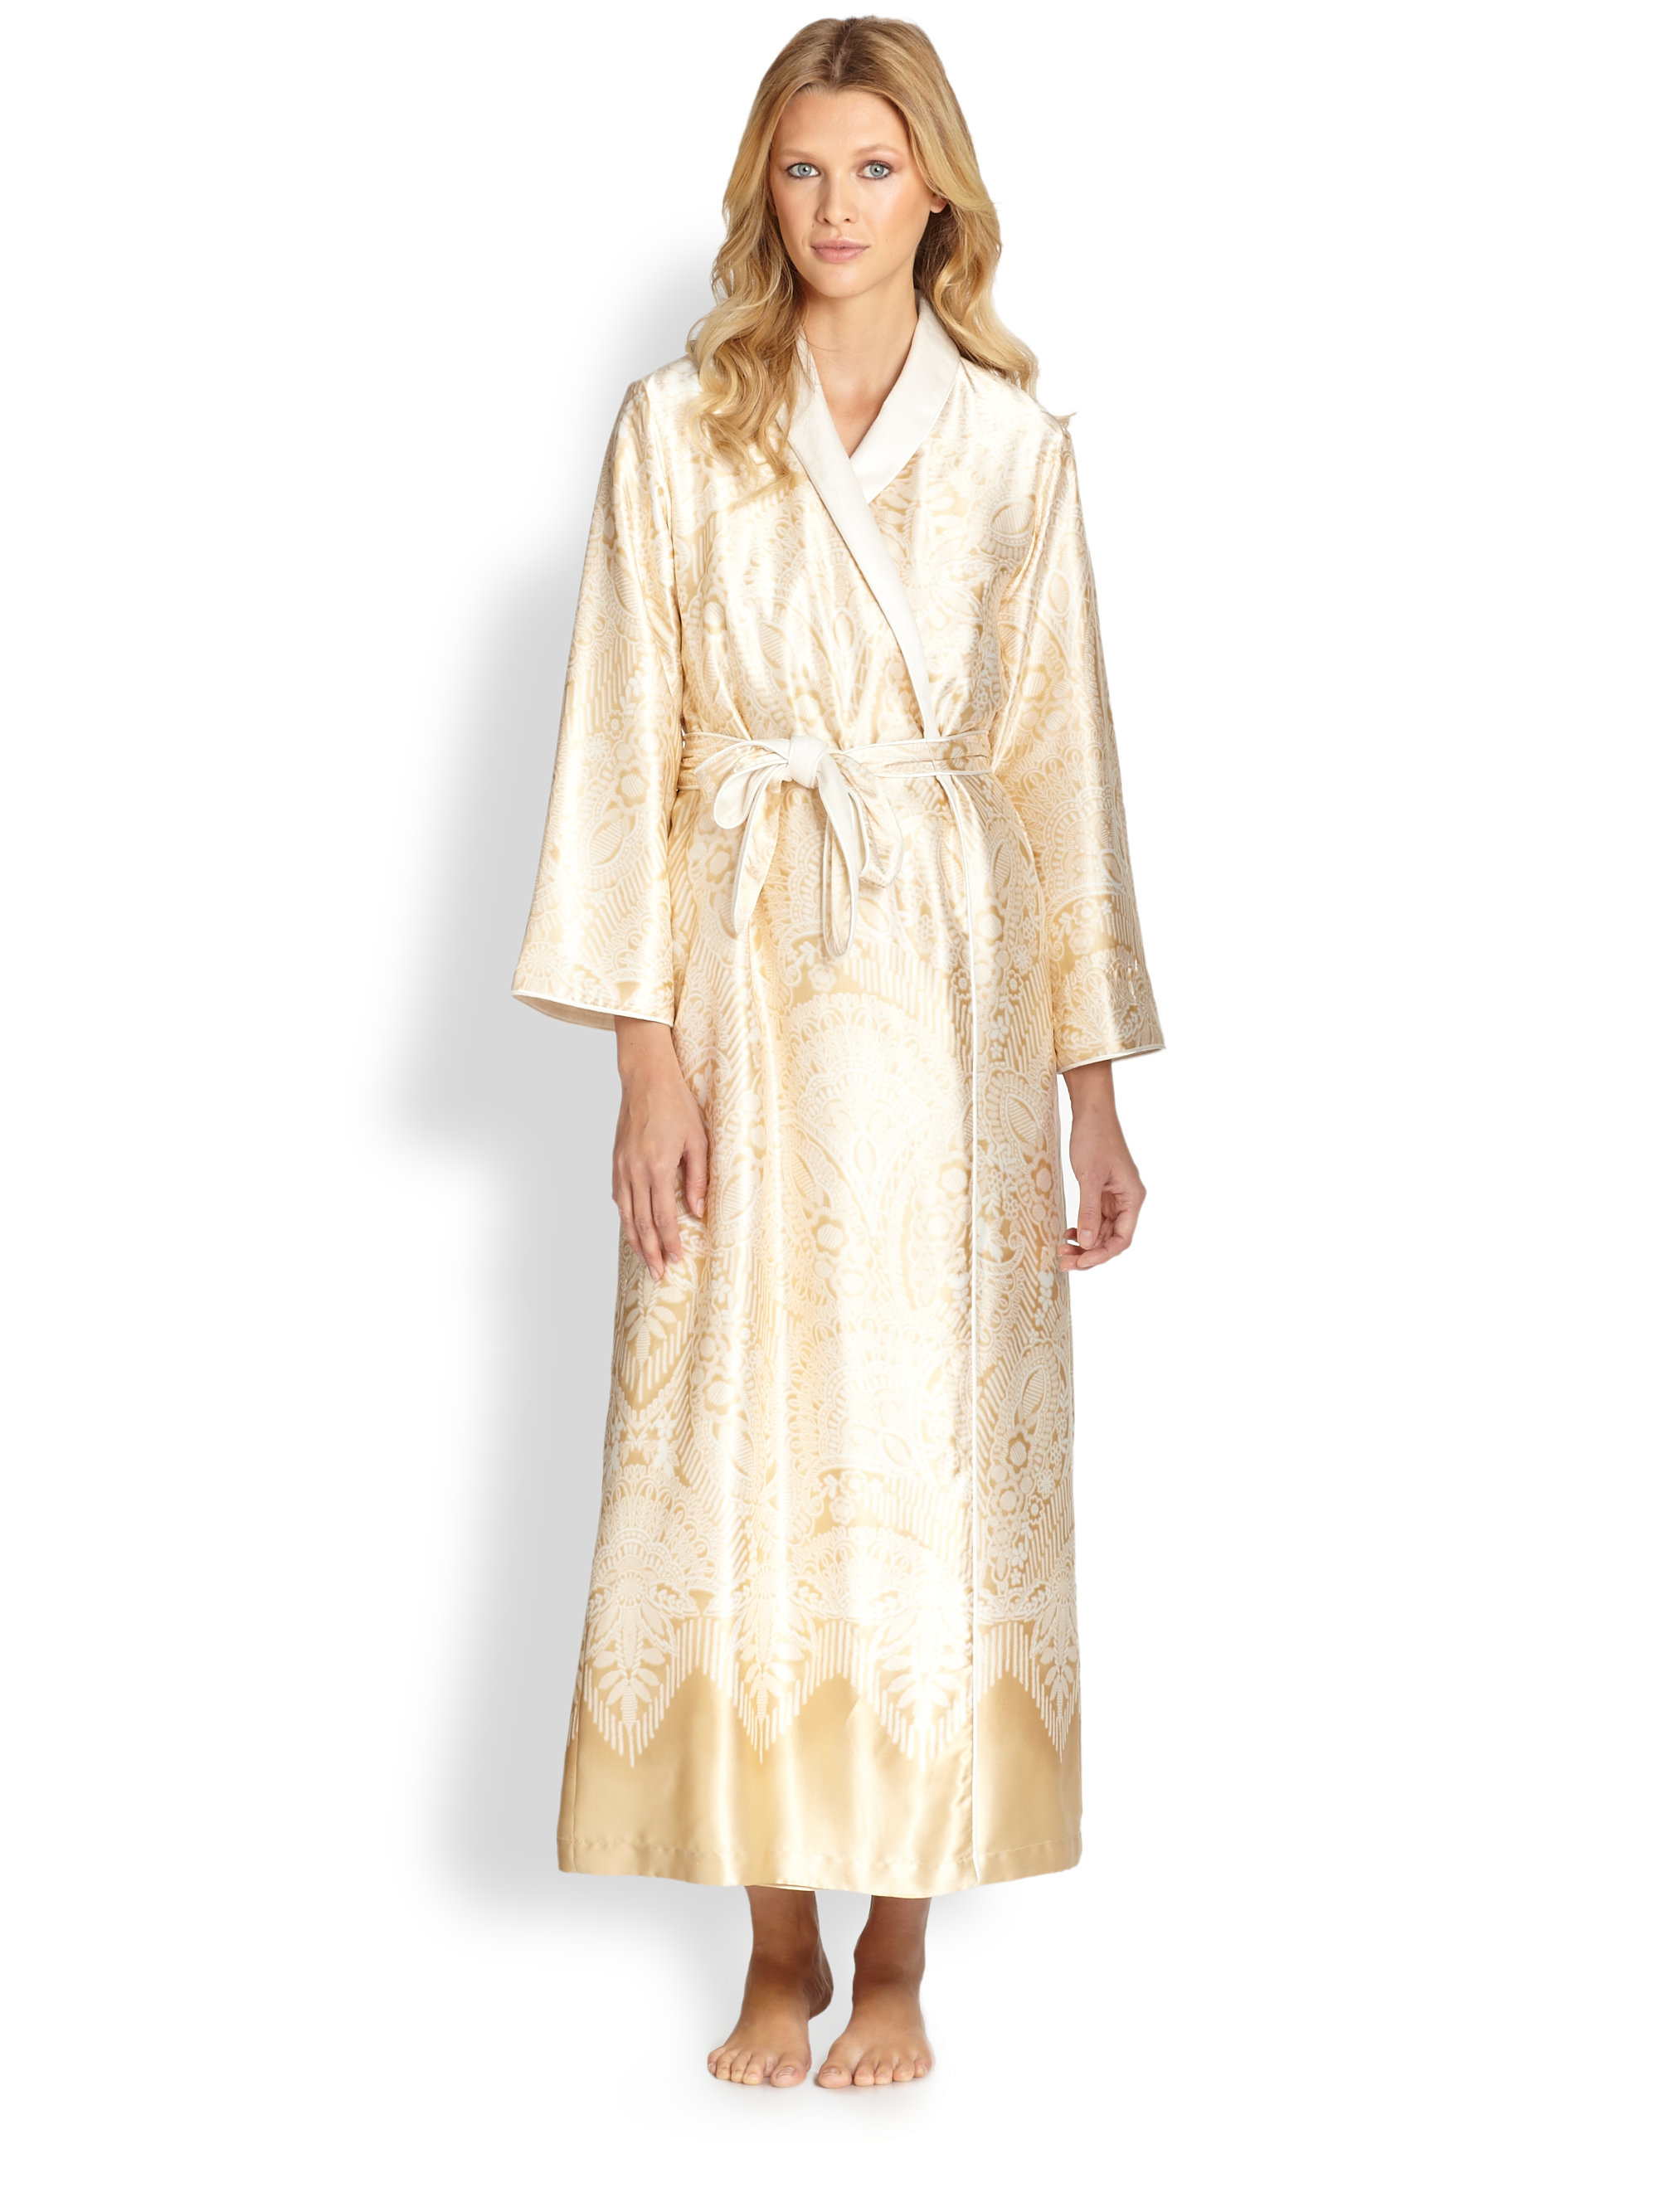 lyst oscar de la renta faux furlined satin print robe in metallic. Black Bedroom Furniture Sets. Home Design Ideas